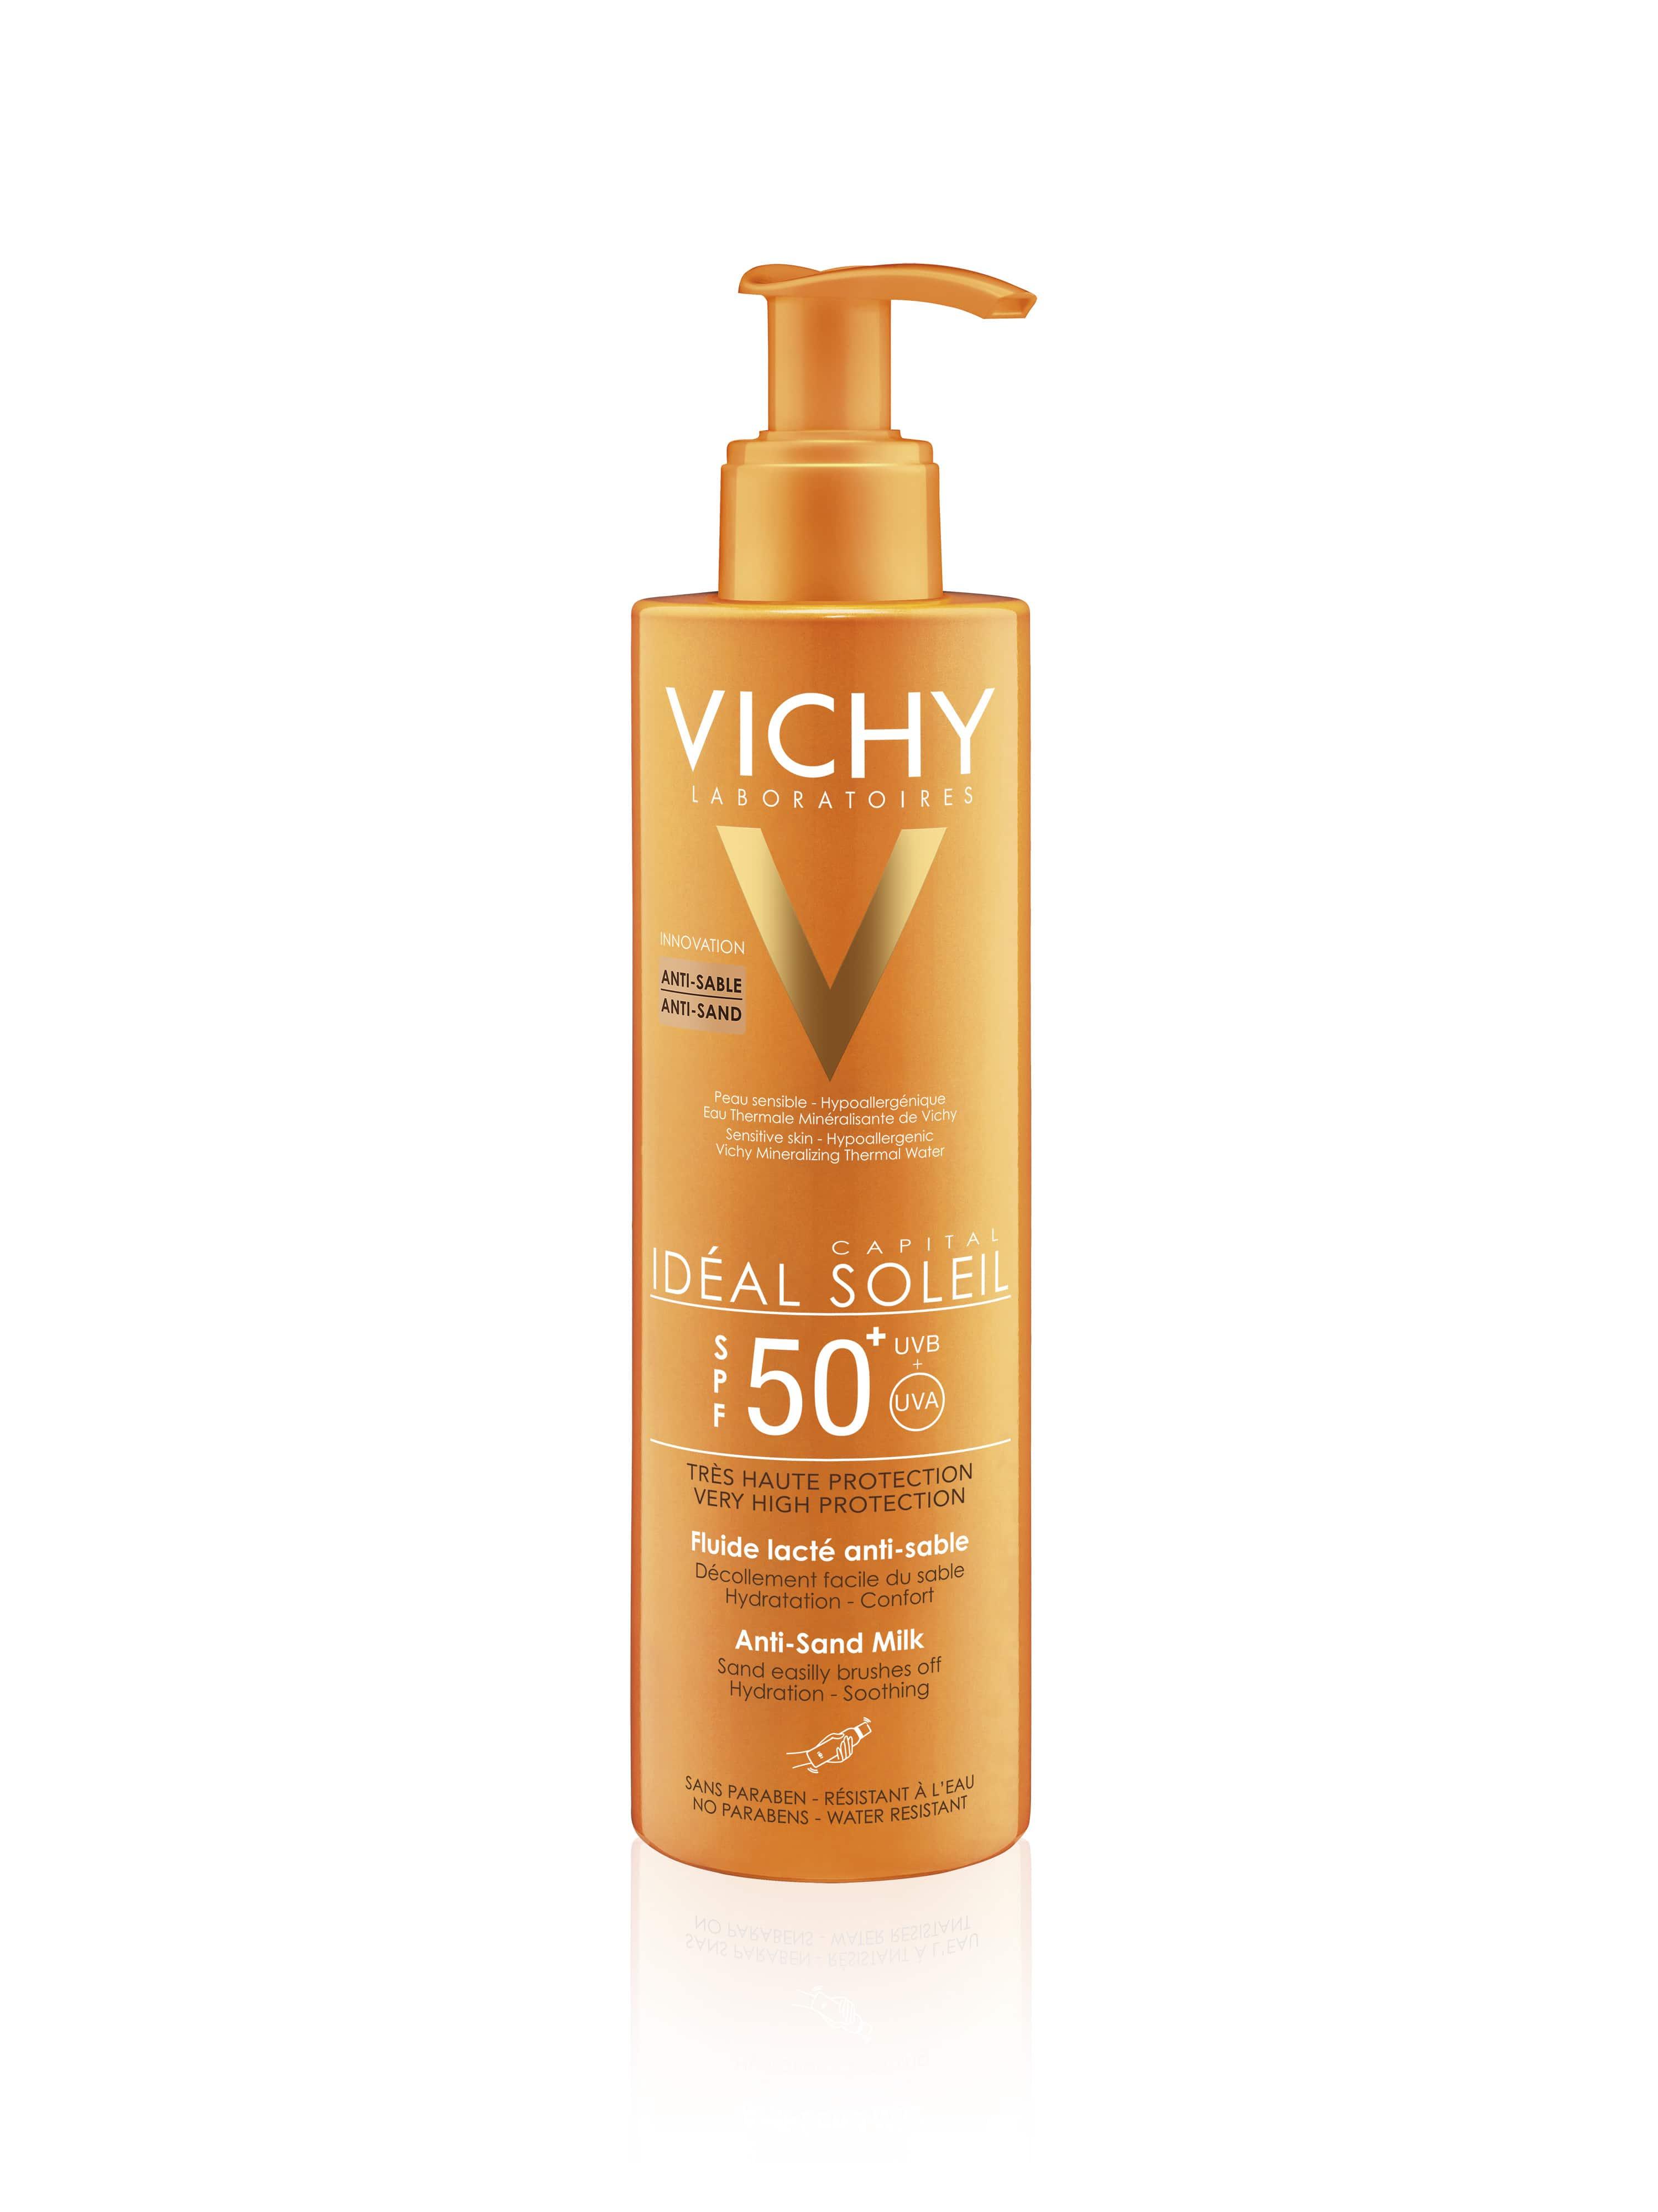 Vichy Ideal Soleil SPF50 Αντιηλιακό Γαλάκτωμα που απομακρύνει την Άμμο από την επιδερμίδα, για Σώμα & Πρόσωπο, 200ml